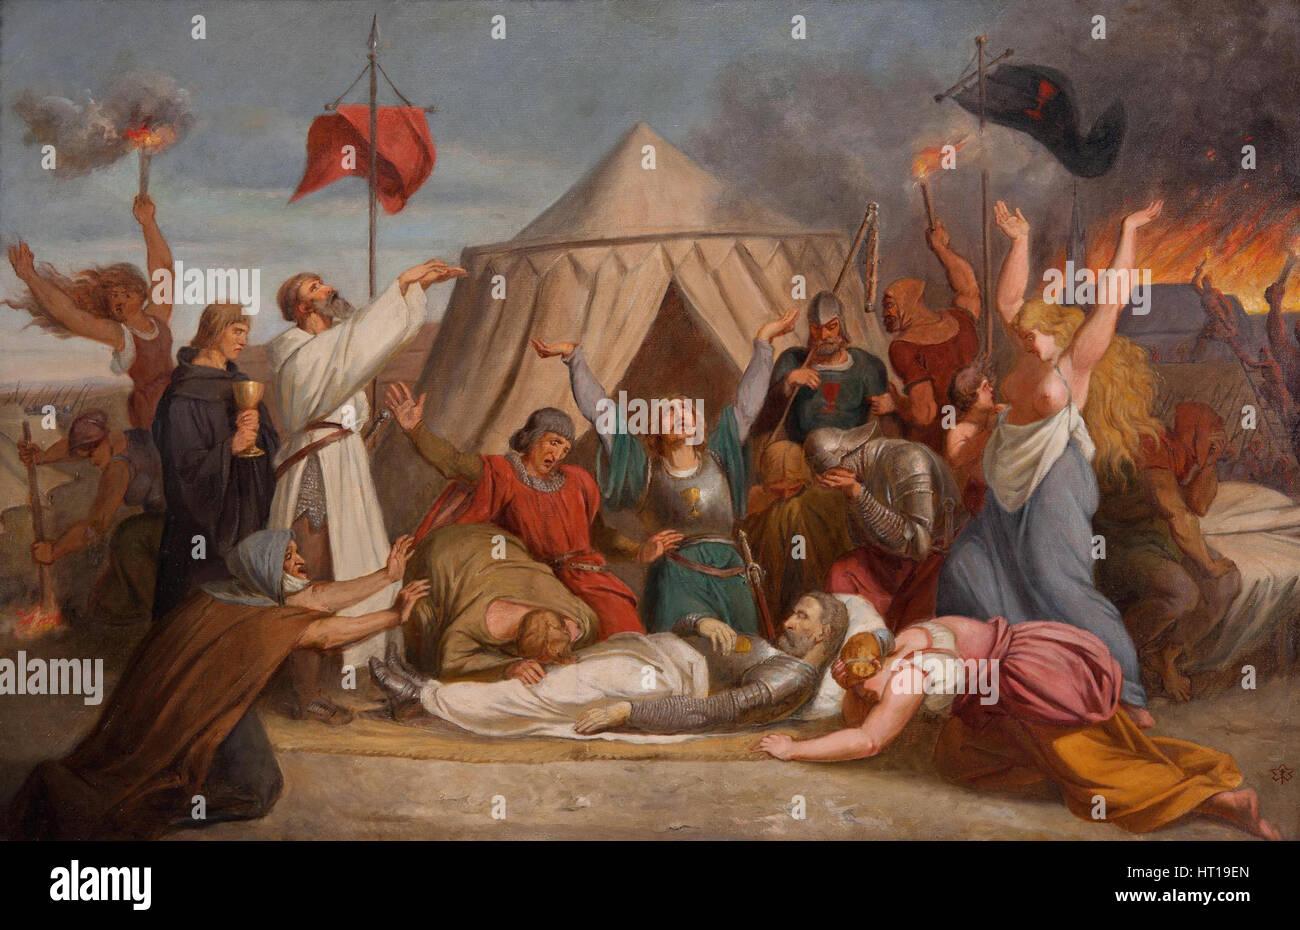 The Death of John Zizka, c. 1850. Artist: Javurek, Karel (1815-1909) - Stock Image